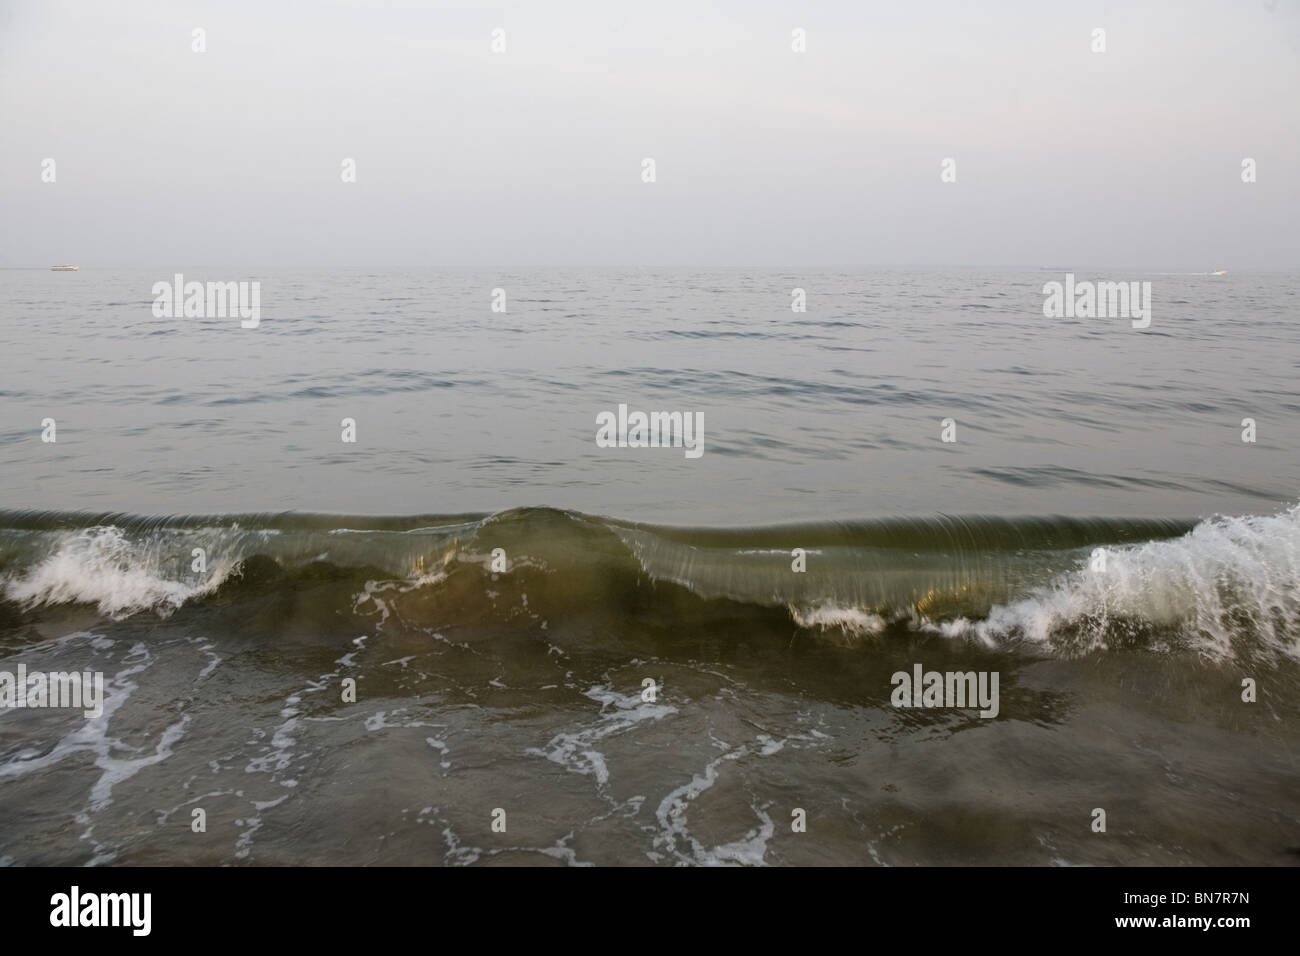 Breaking wave off Brighton Beach Brooklyn, NY. - Stock Image